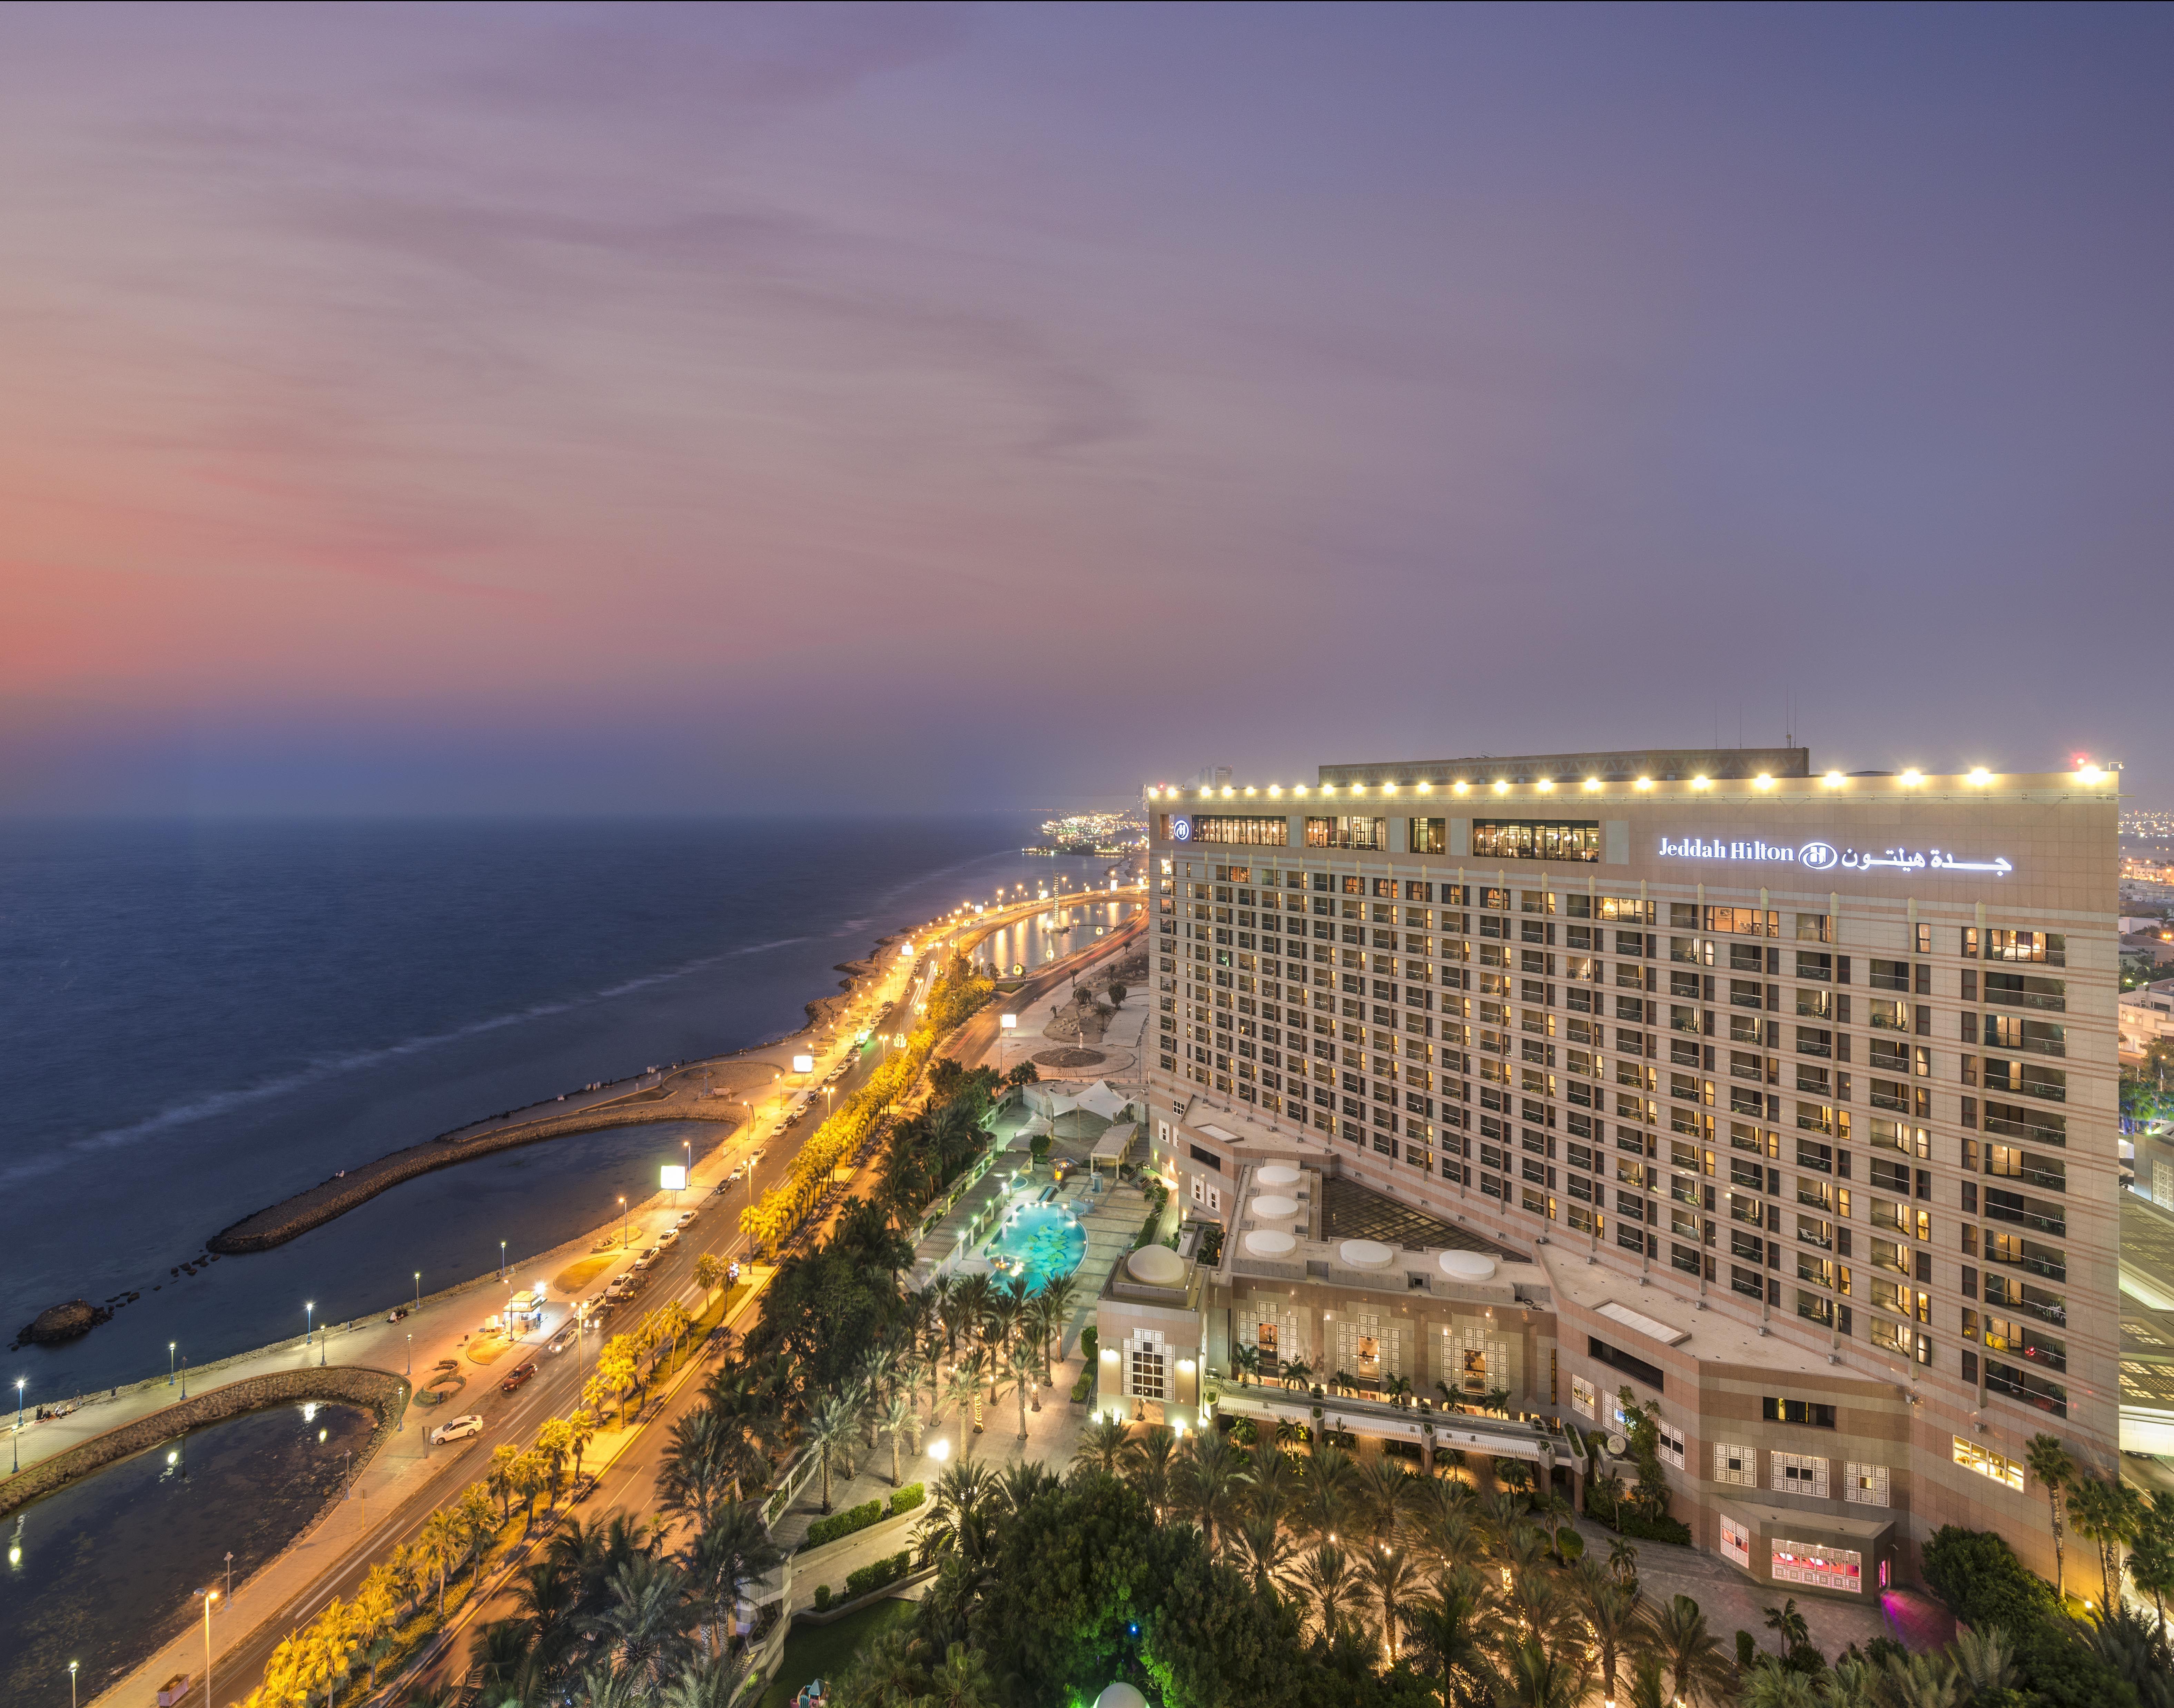 Jeddah Hilton هيليتون جدة Jeddah Weather And Climate Hilton Hotel